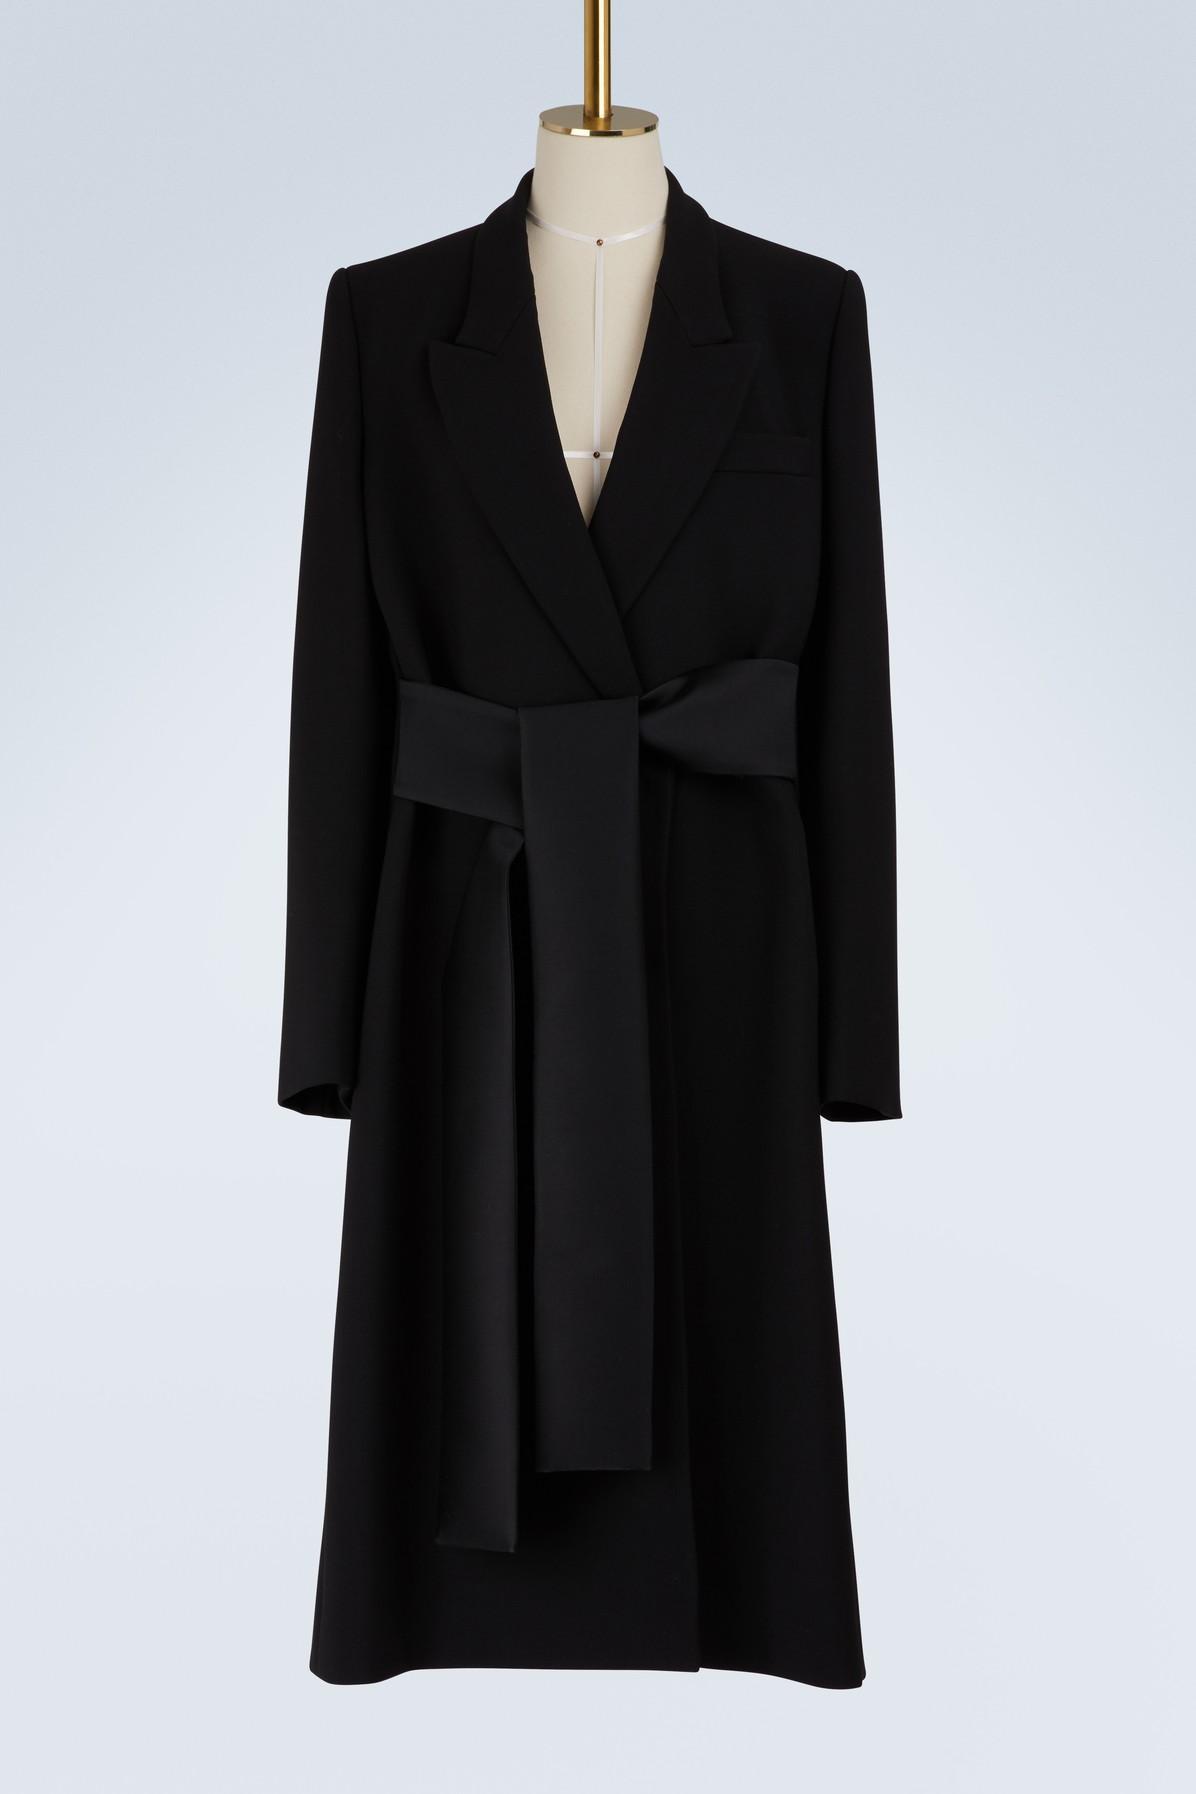 Stella Mccartney Nina Wool Blend Coat In 1000 - Black